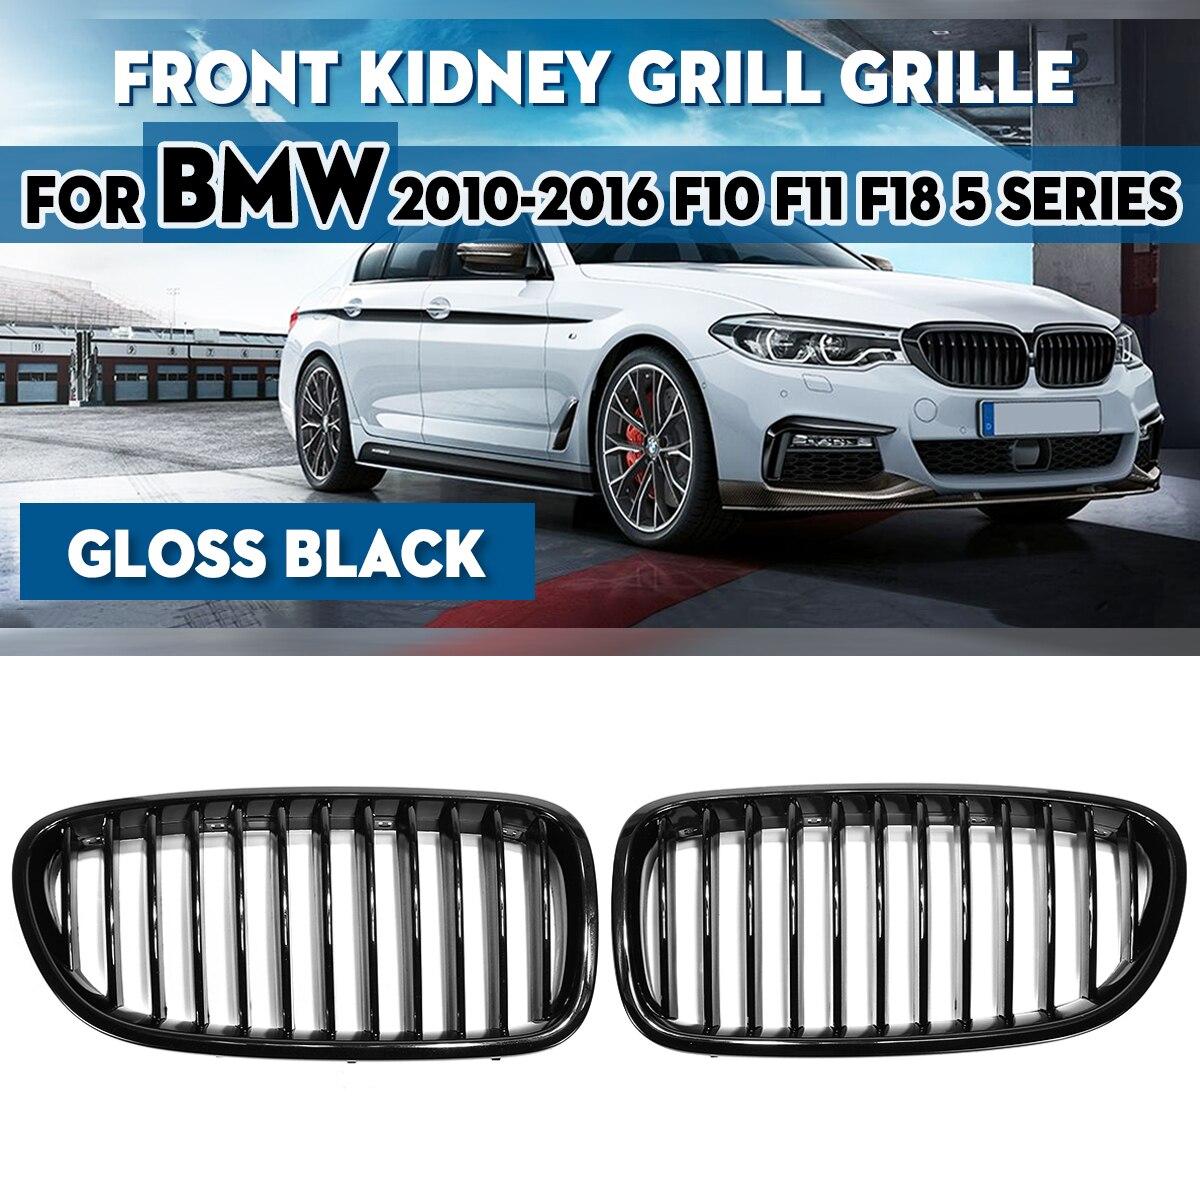 CKS Kidney Grill Grille Grills Gloss Black Black BM01-F1014M-BK